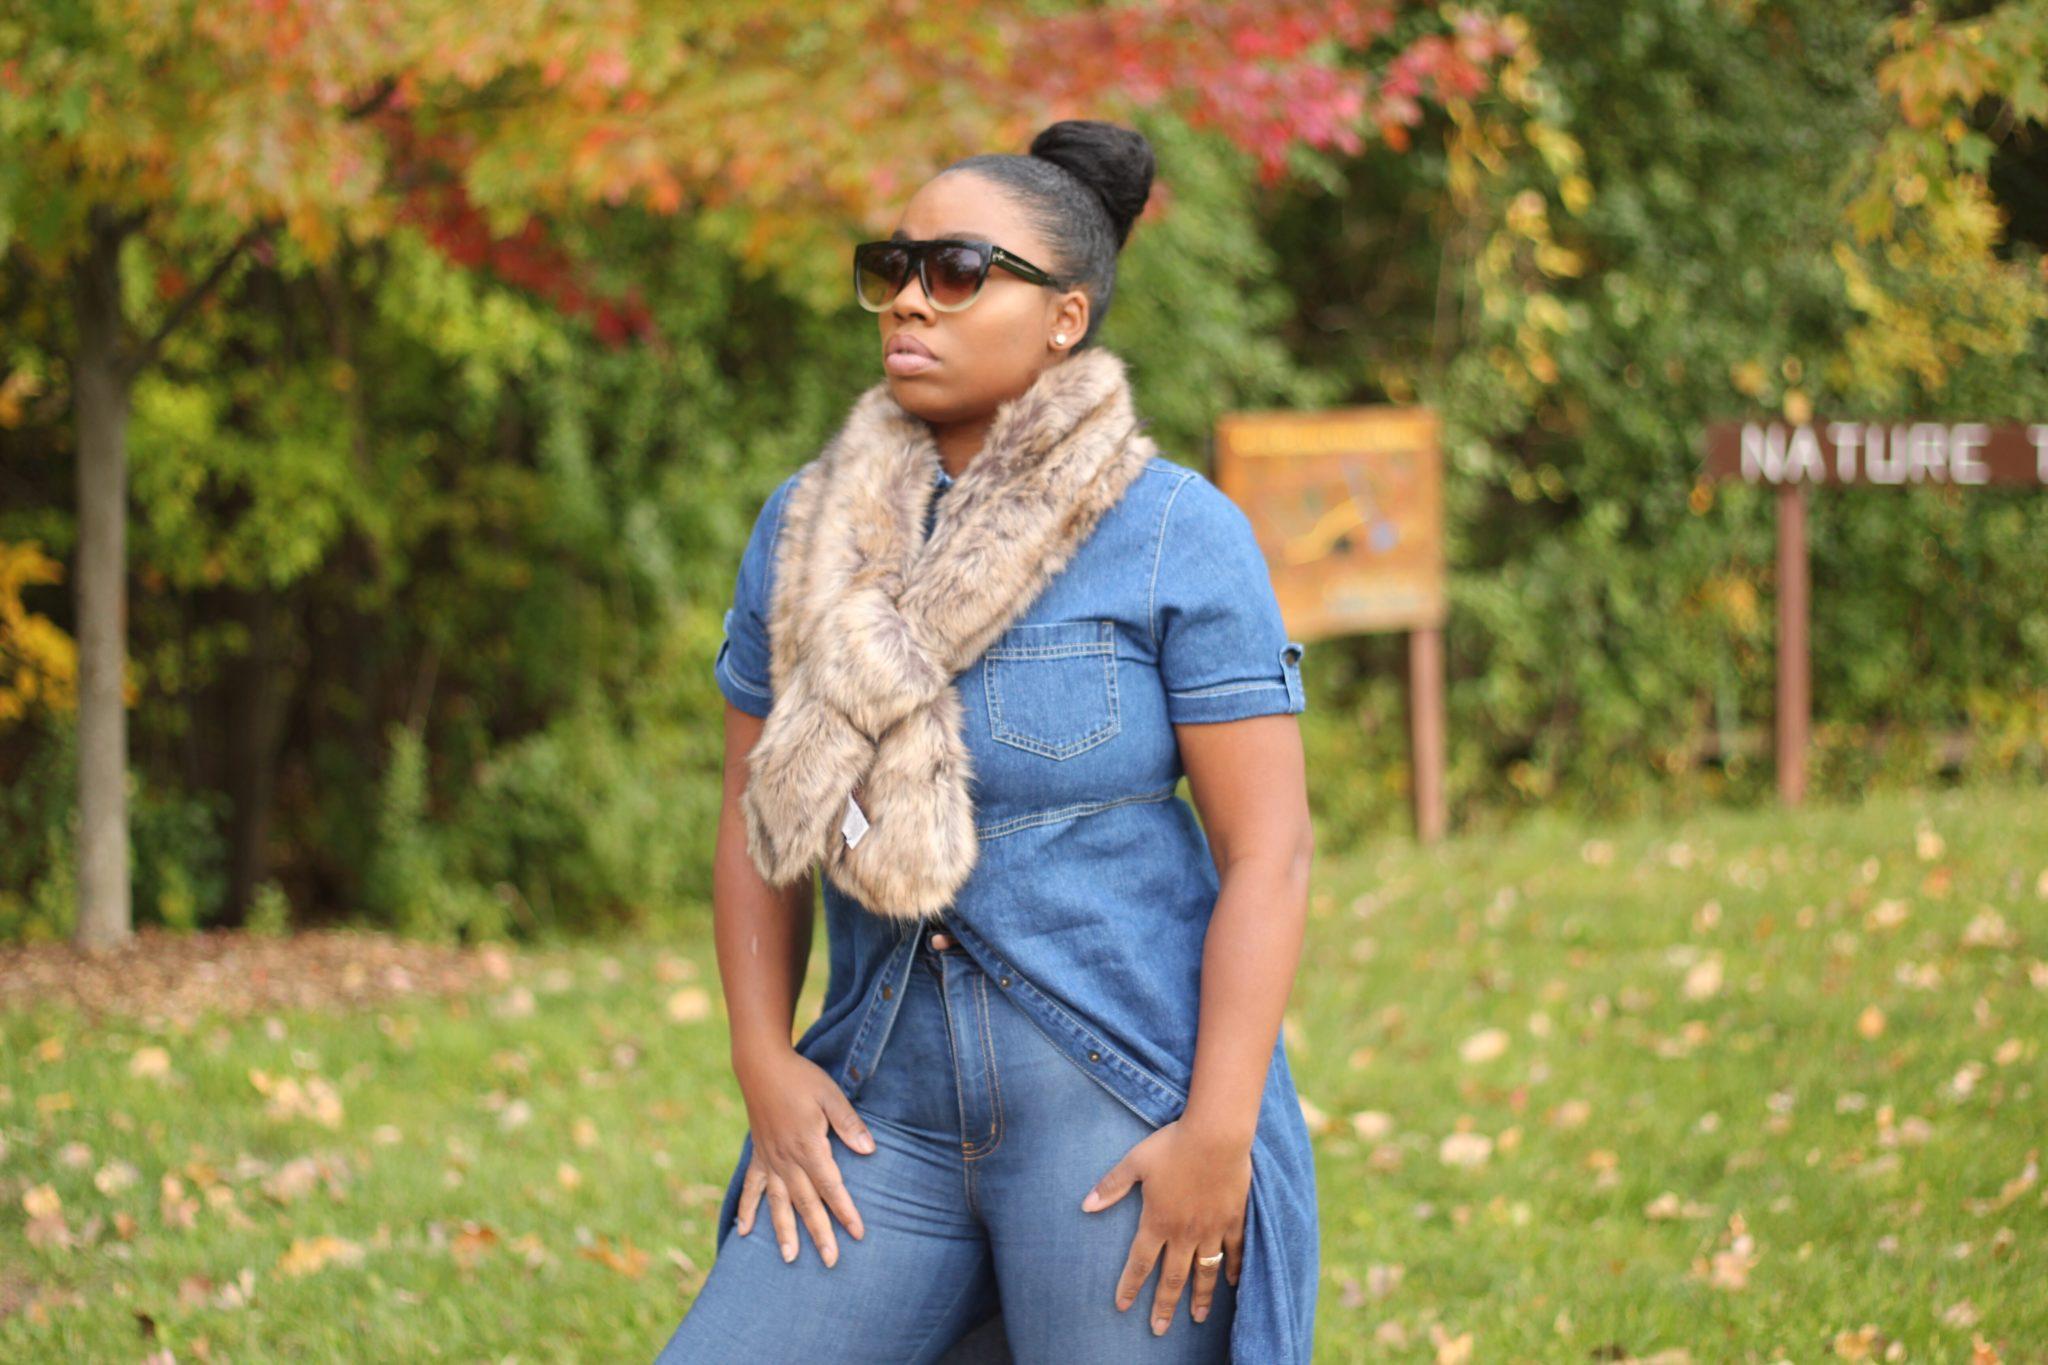 img_7702 Denim Done Right!Fall 2016 Fashion Fashion Nova Jewelmint OOTD Styling Uncategorized